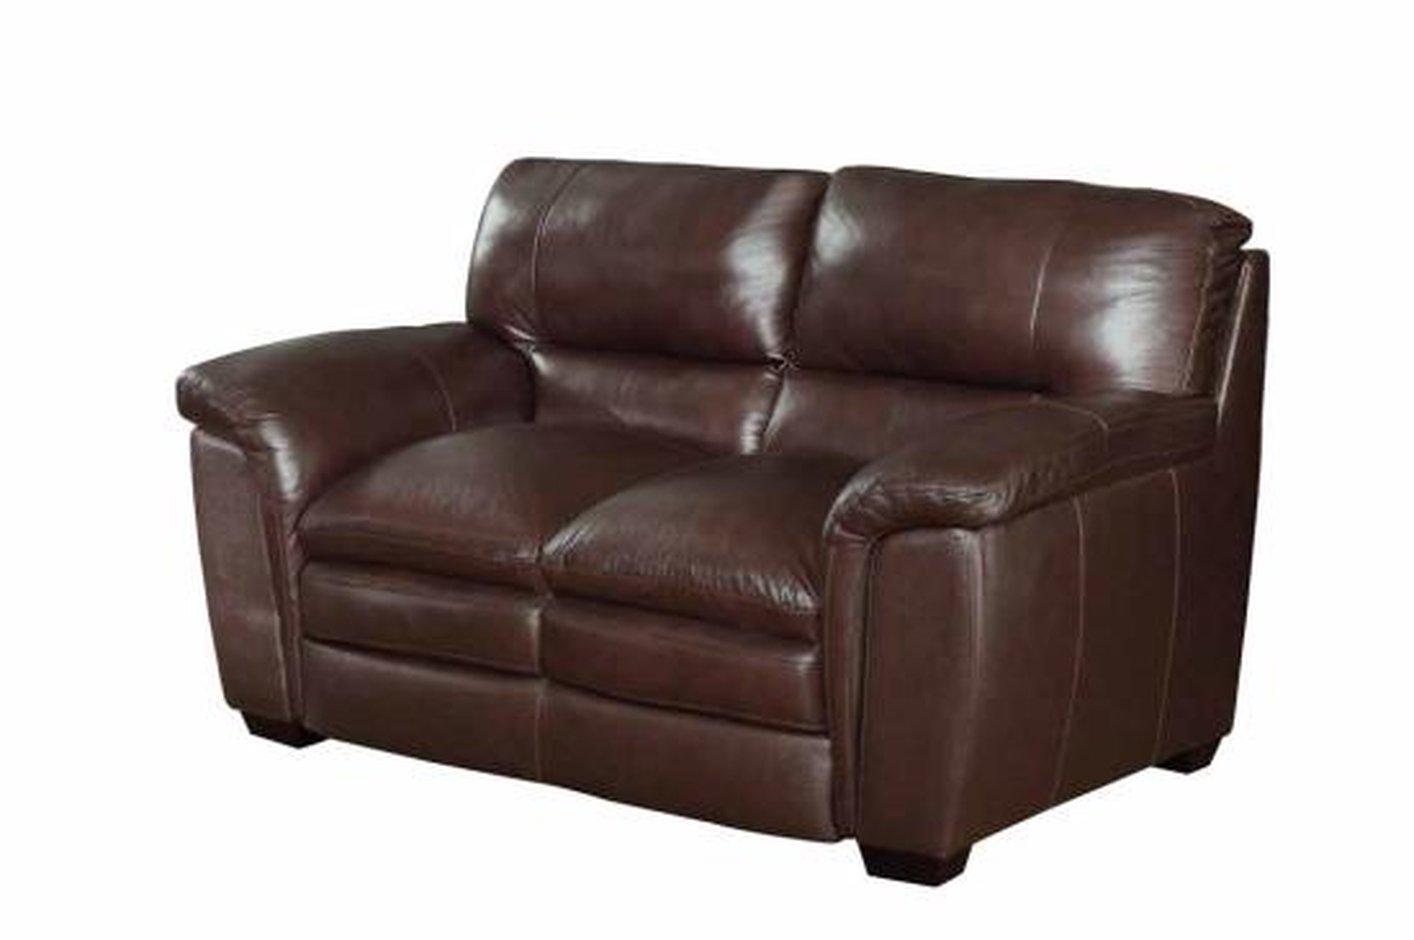 Brown leather loveseat burton brown leather loveseat LAMZCHH